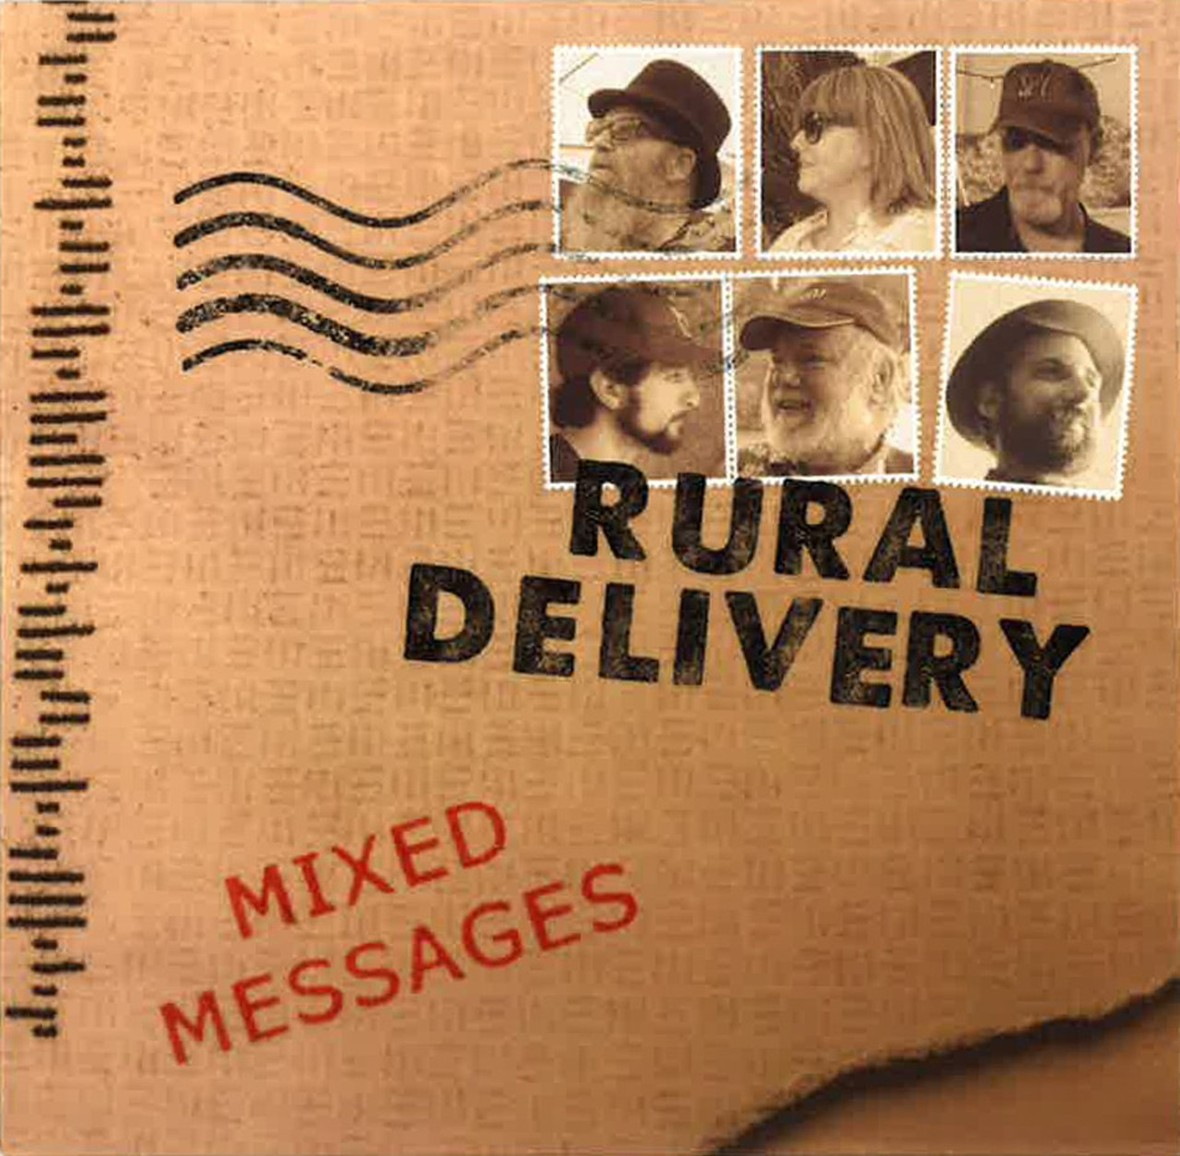 rural-delivery-album-art